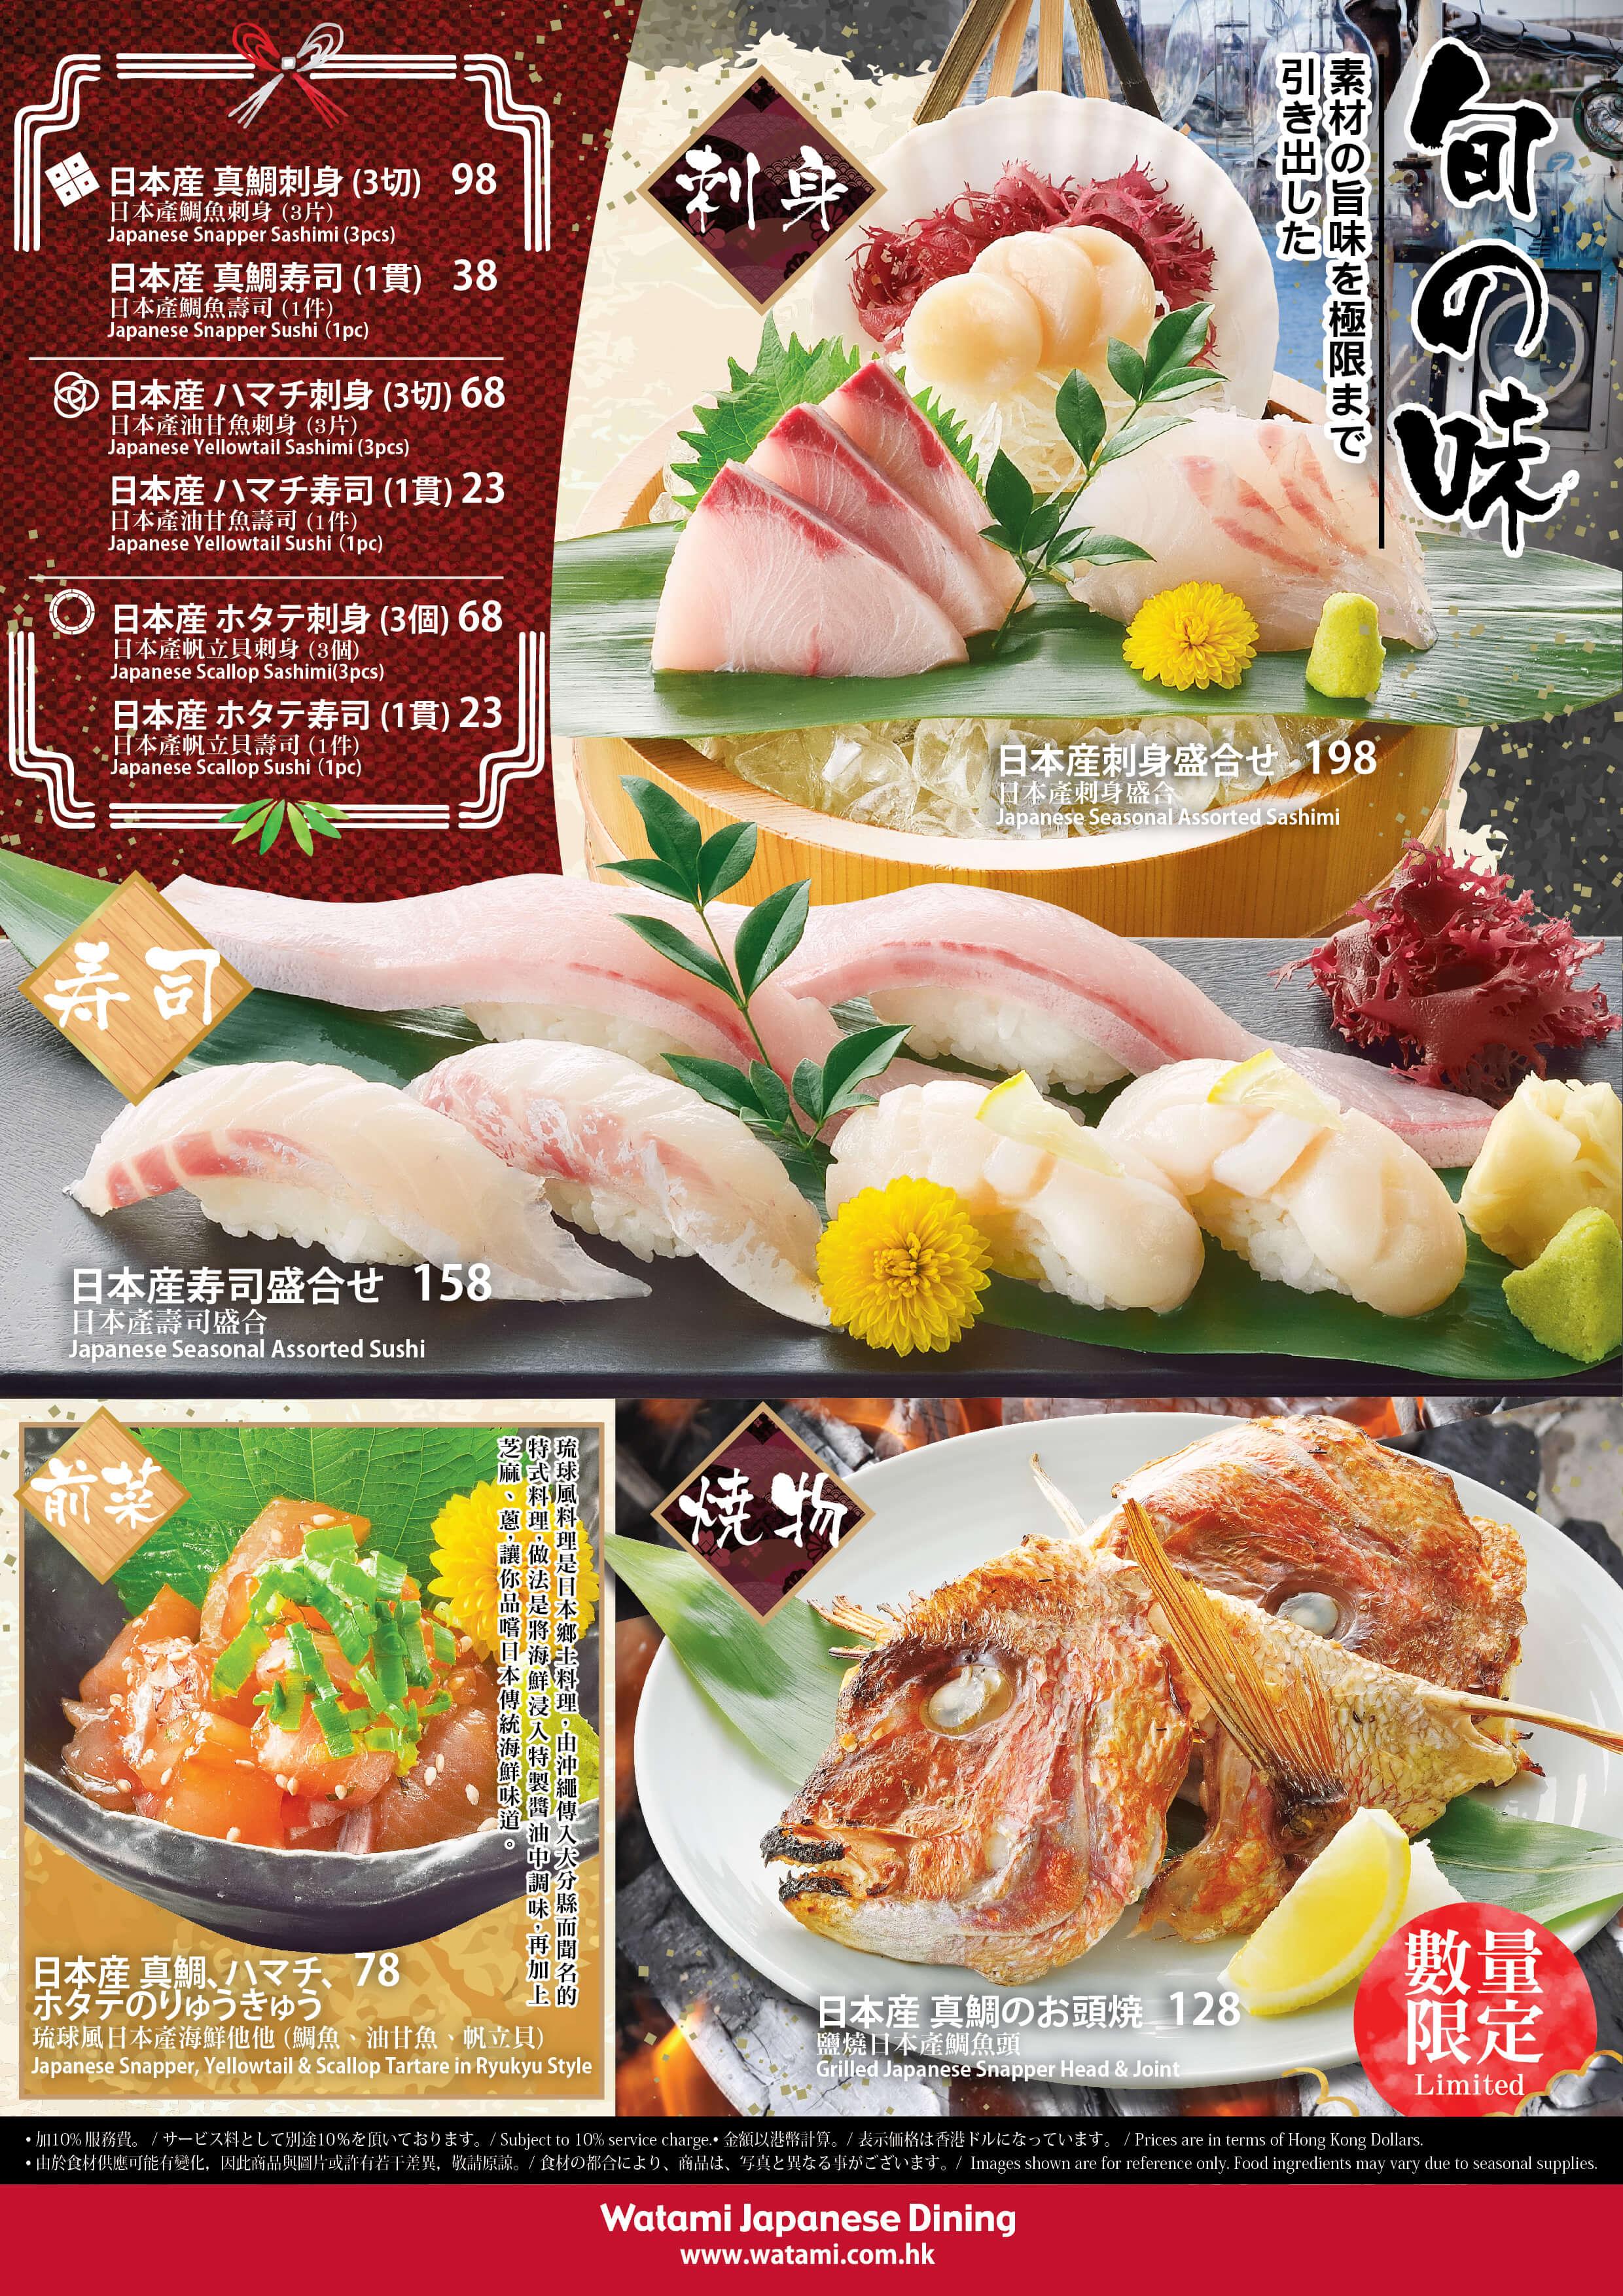 Watami_JPfood_menu_back_AW-01.jpg